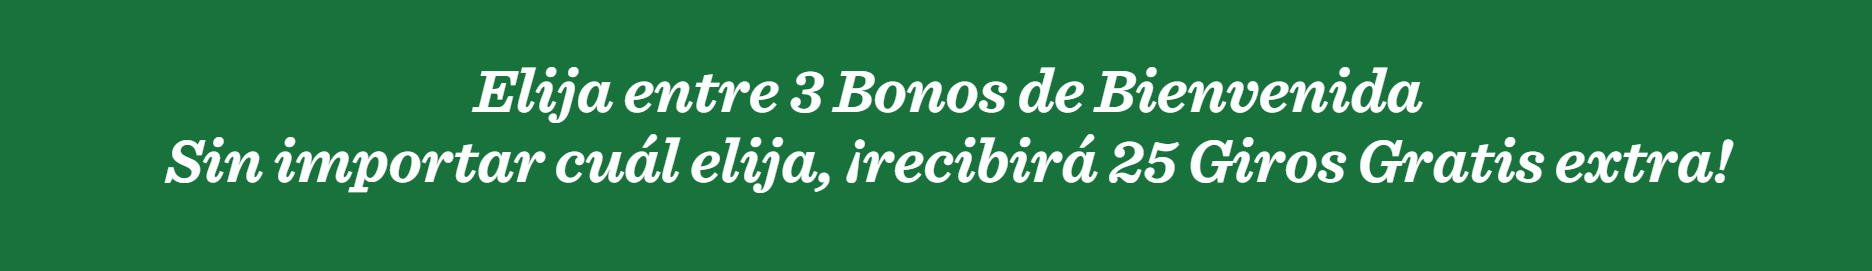 bonos-bienvenida-mr-green-tiradas-gratis